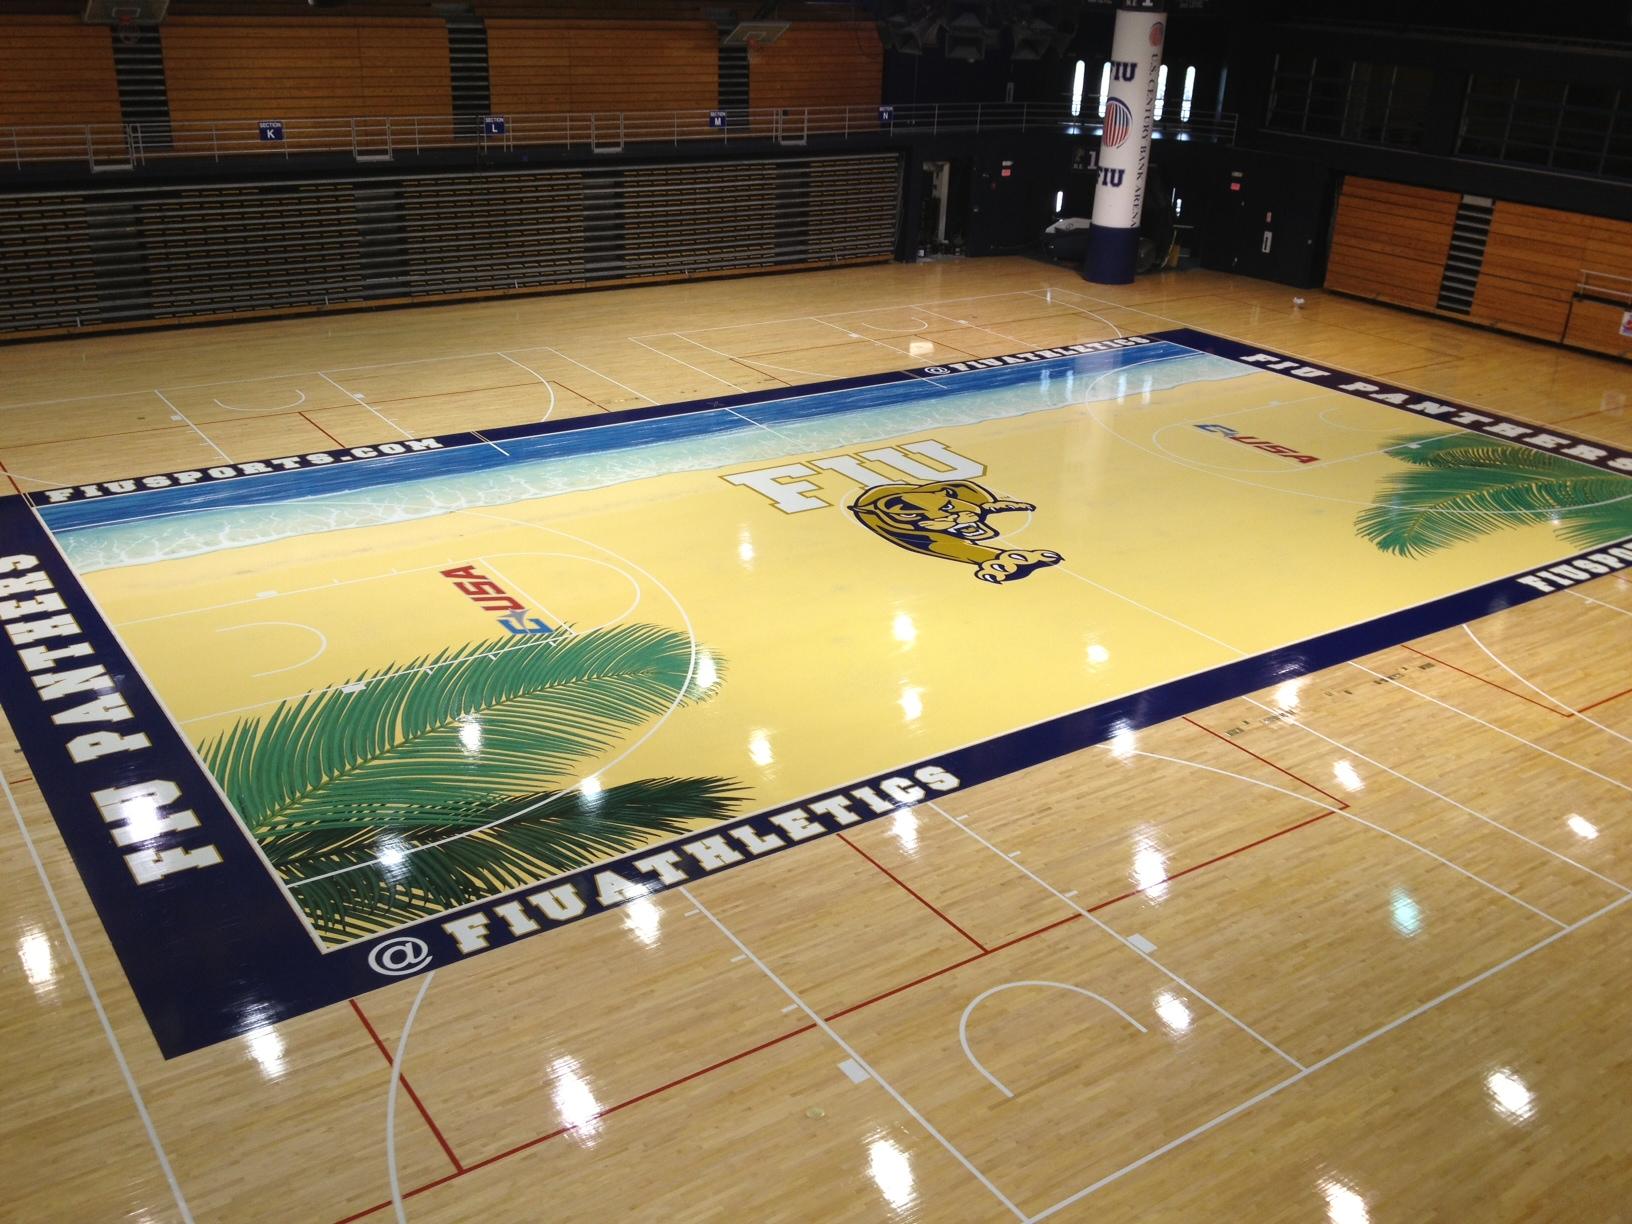 Oregon's Basketball Court is hard on the eyes : CollegeBasketball